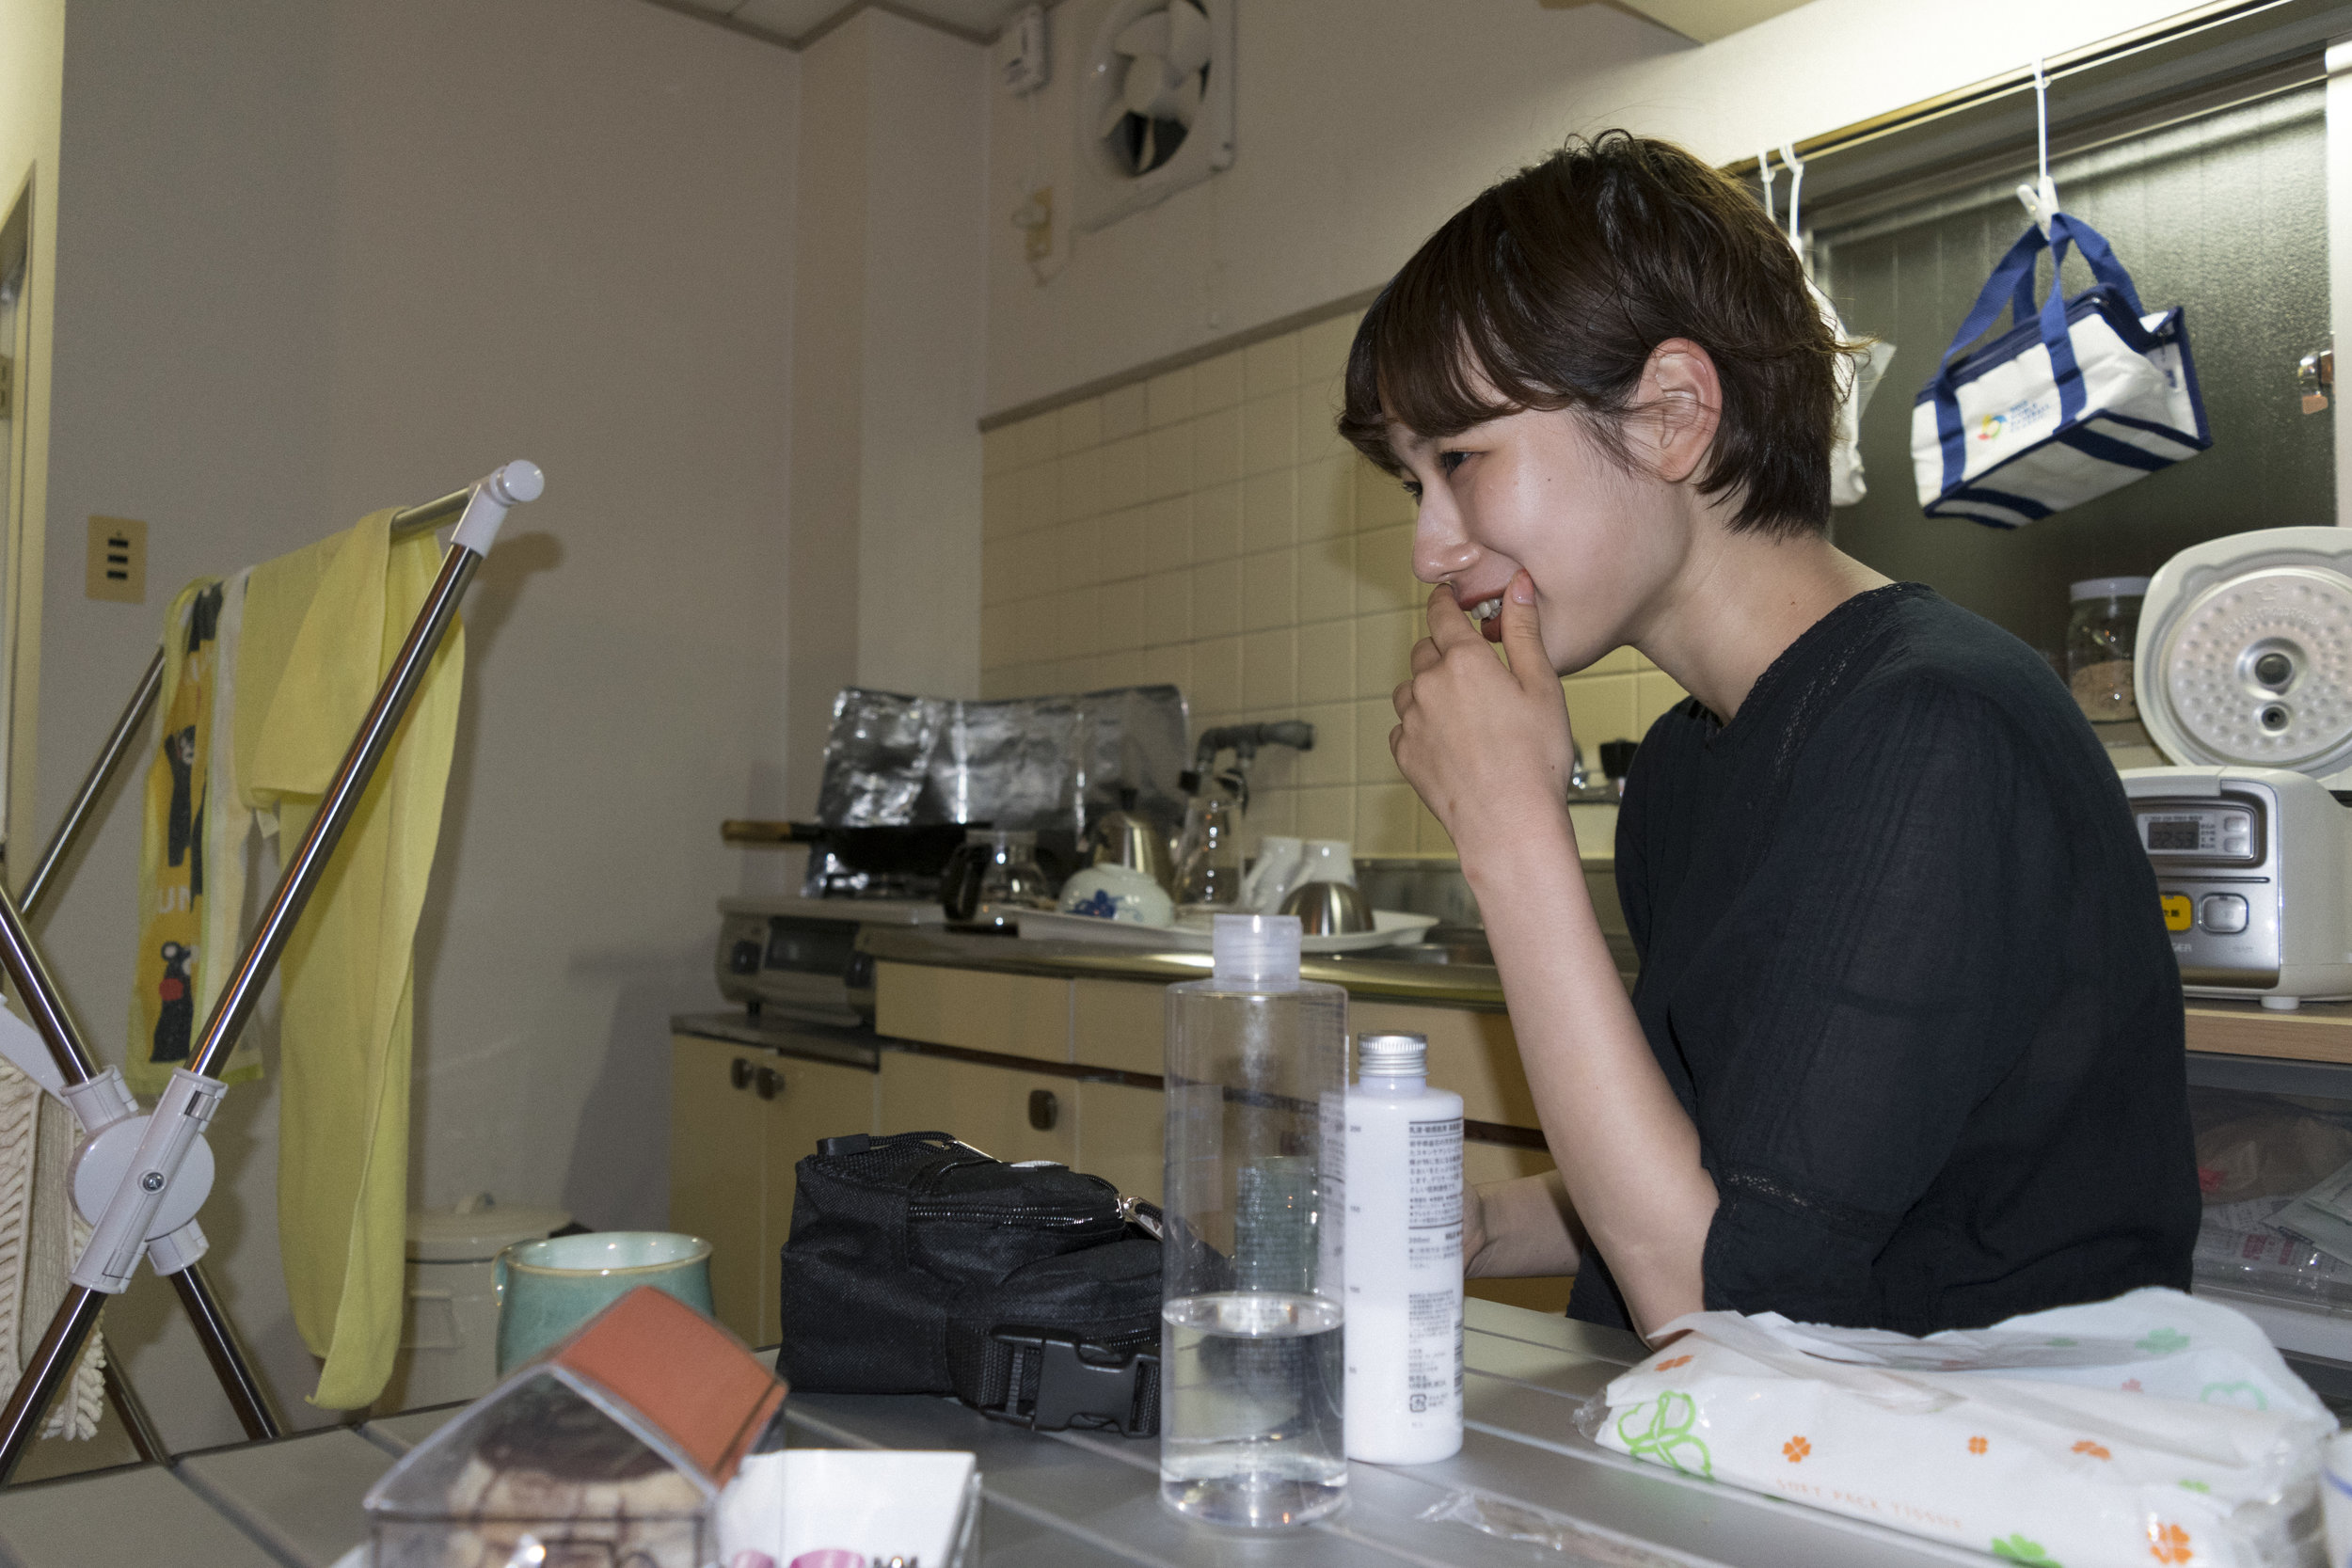 180821_Mitsuo_room-126.jpg